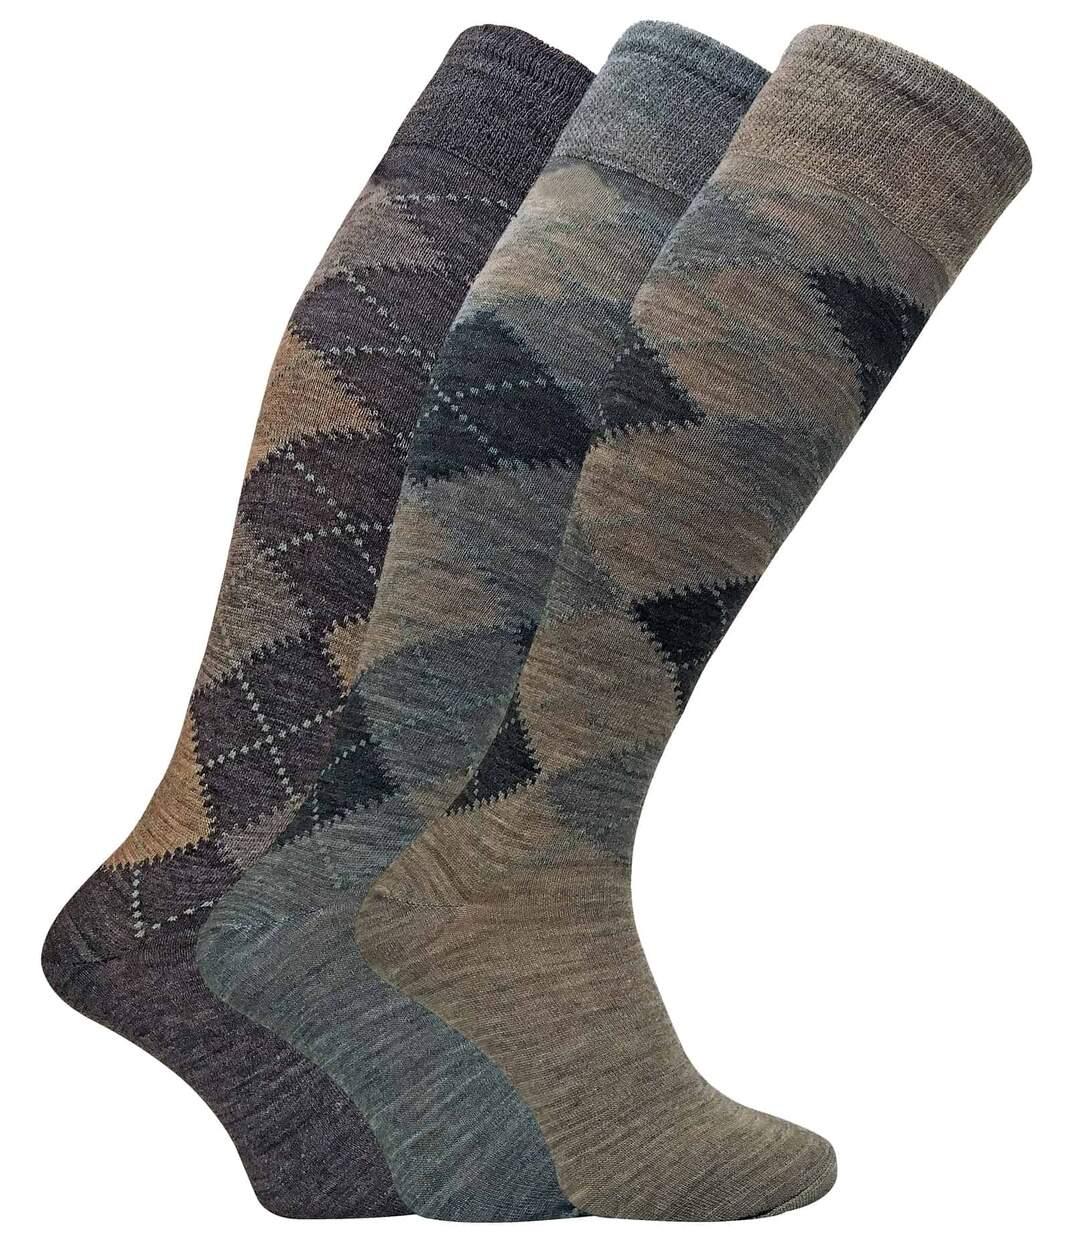 3 Pk Mens Knee High Argyle Lambs Wool Dress Socks